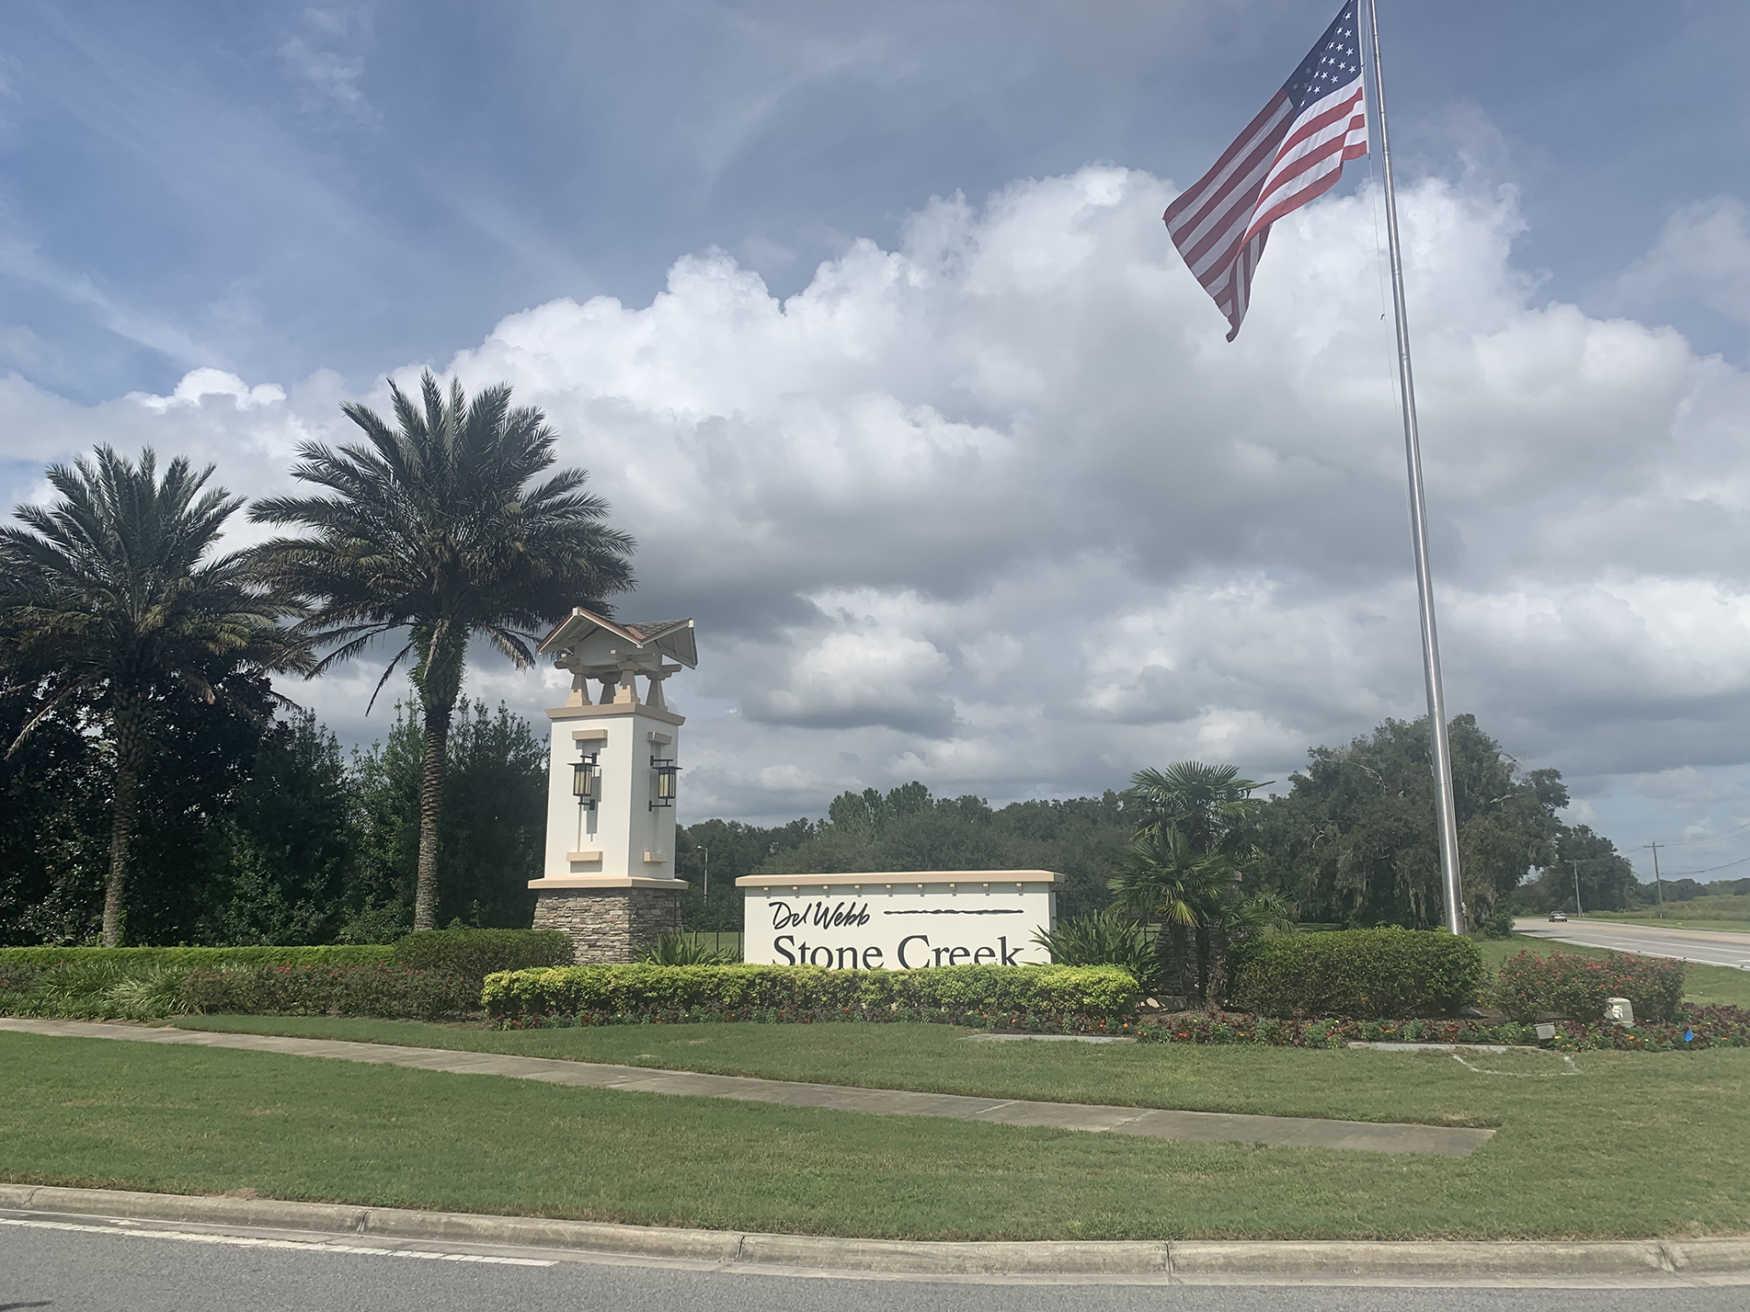 Stone Creek Ocala FL Entrance Sign